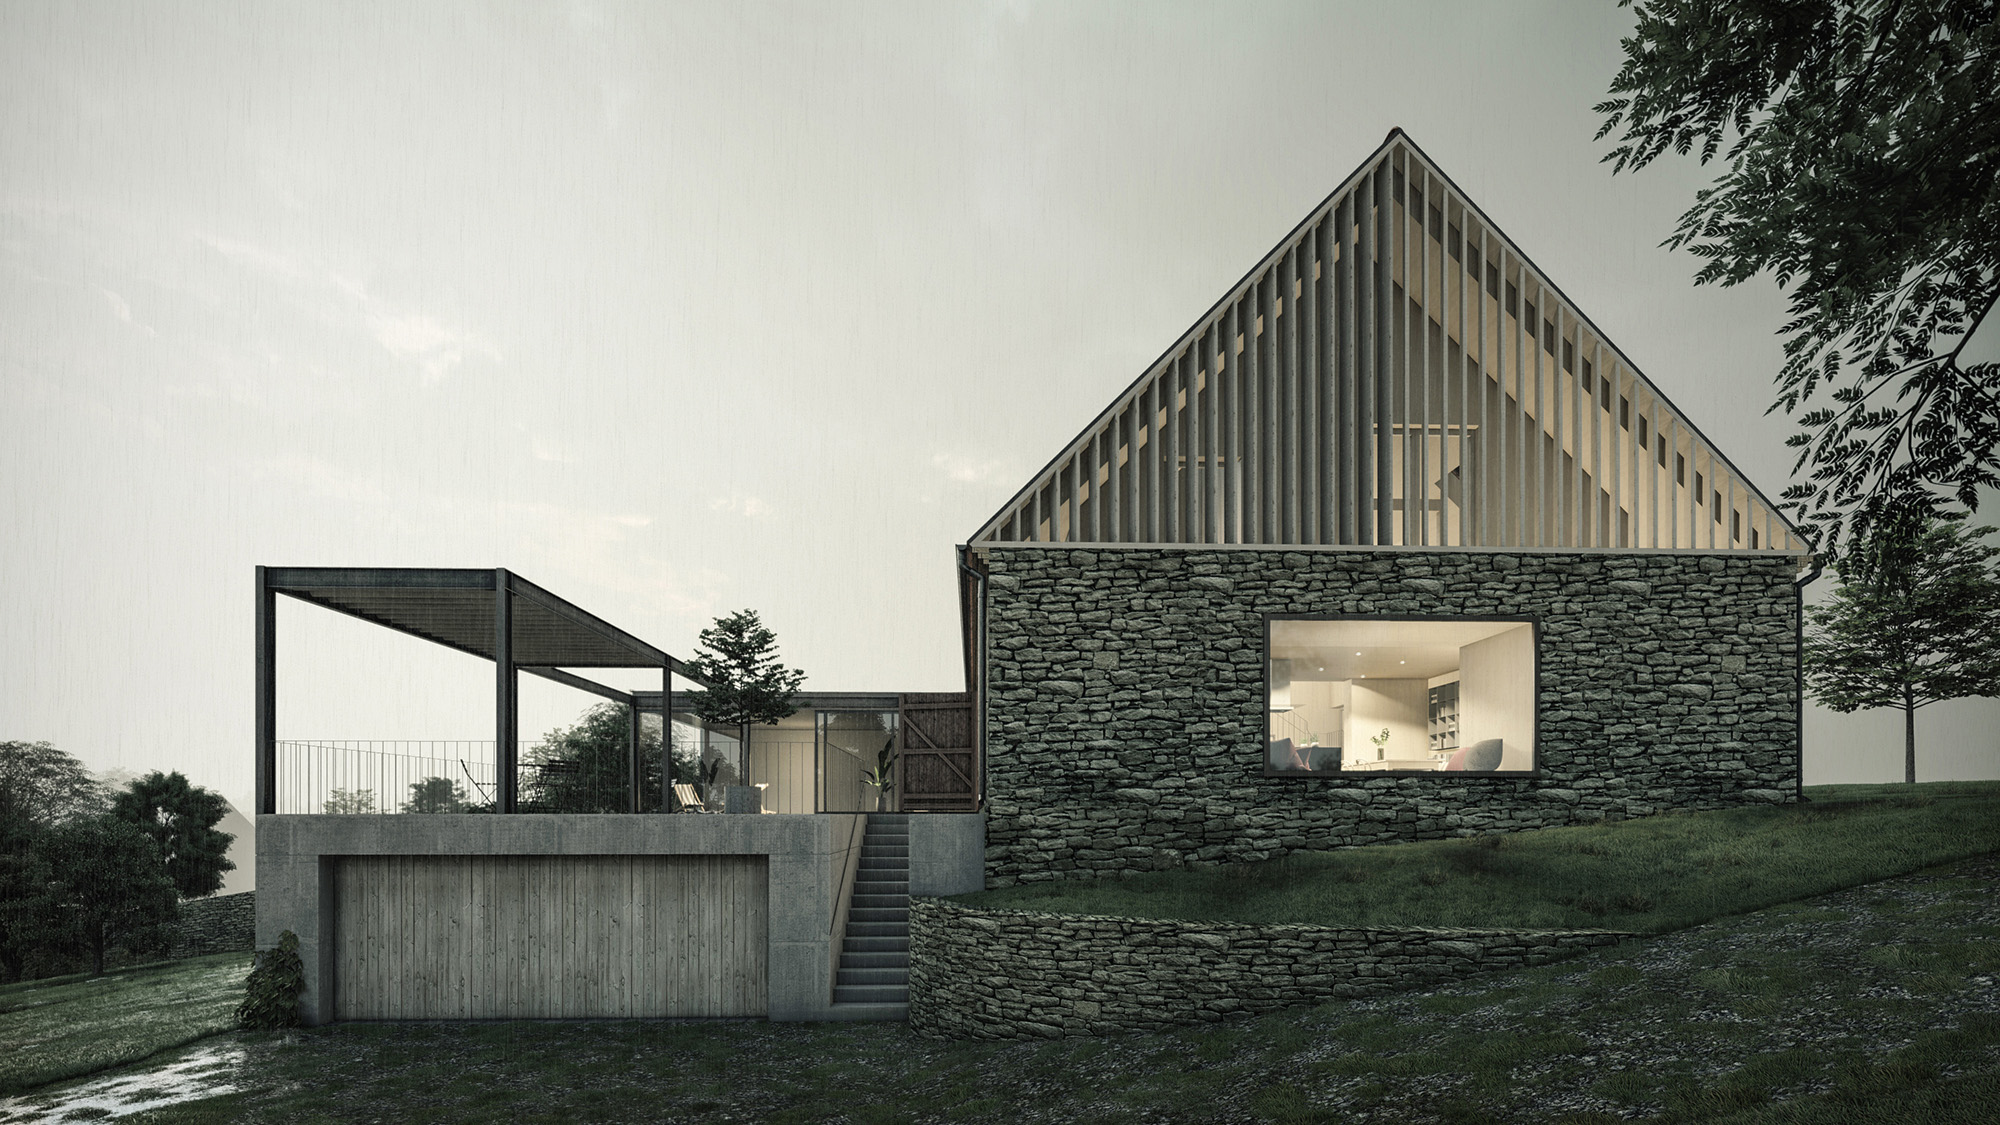 Zavoral Architekt